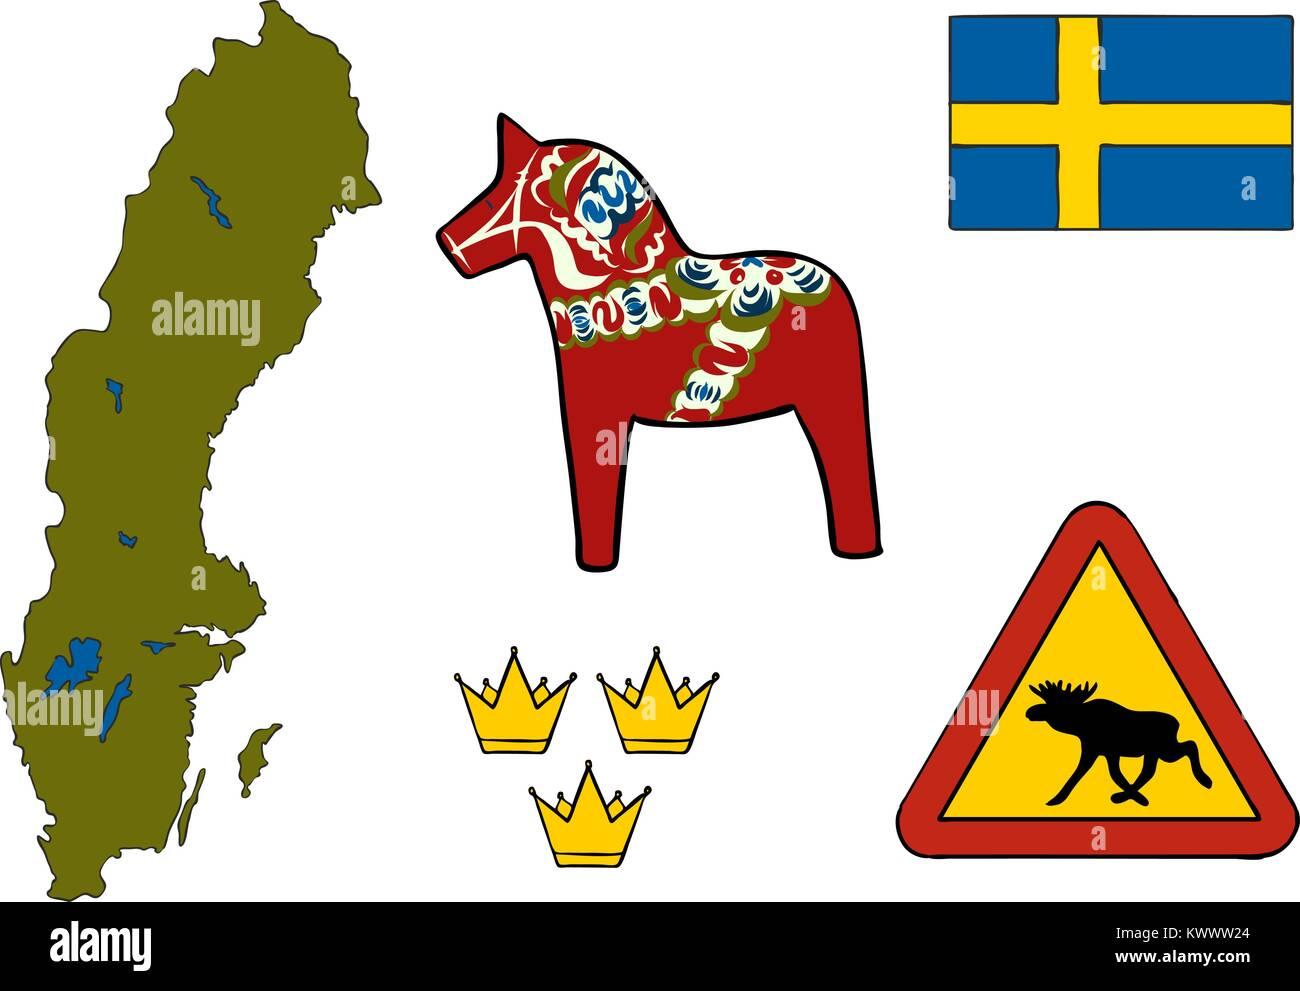 Dalarna Stock Vector Images Alamy